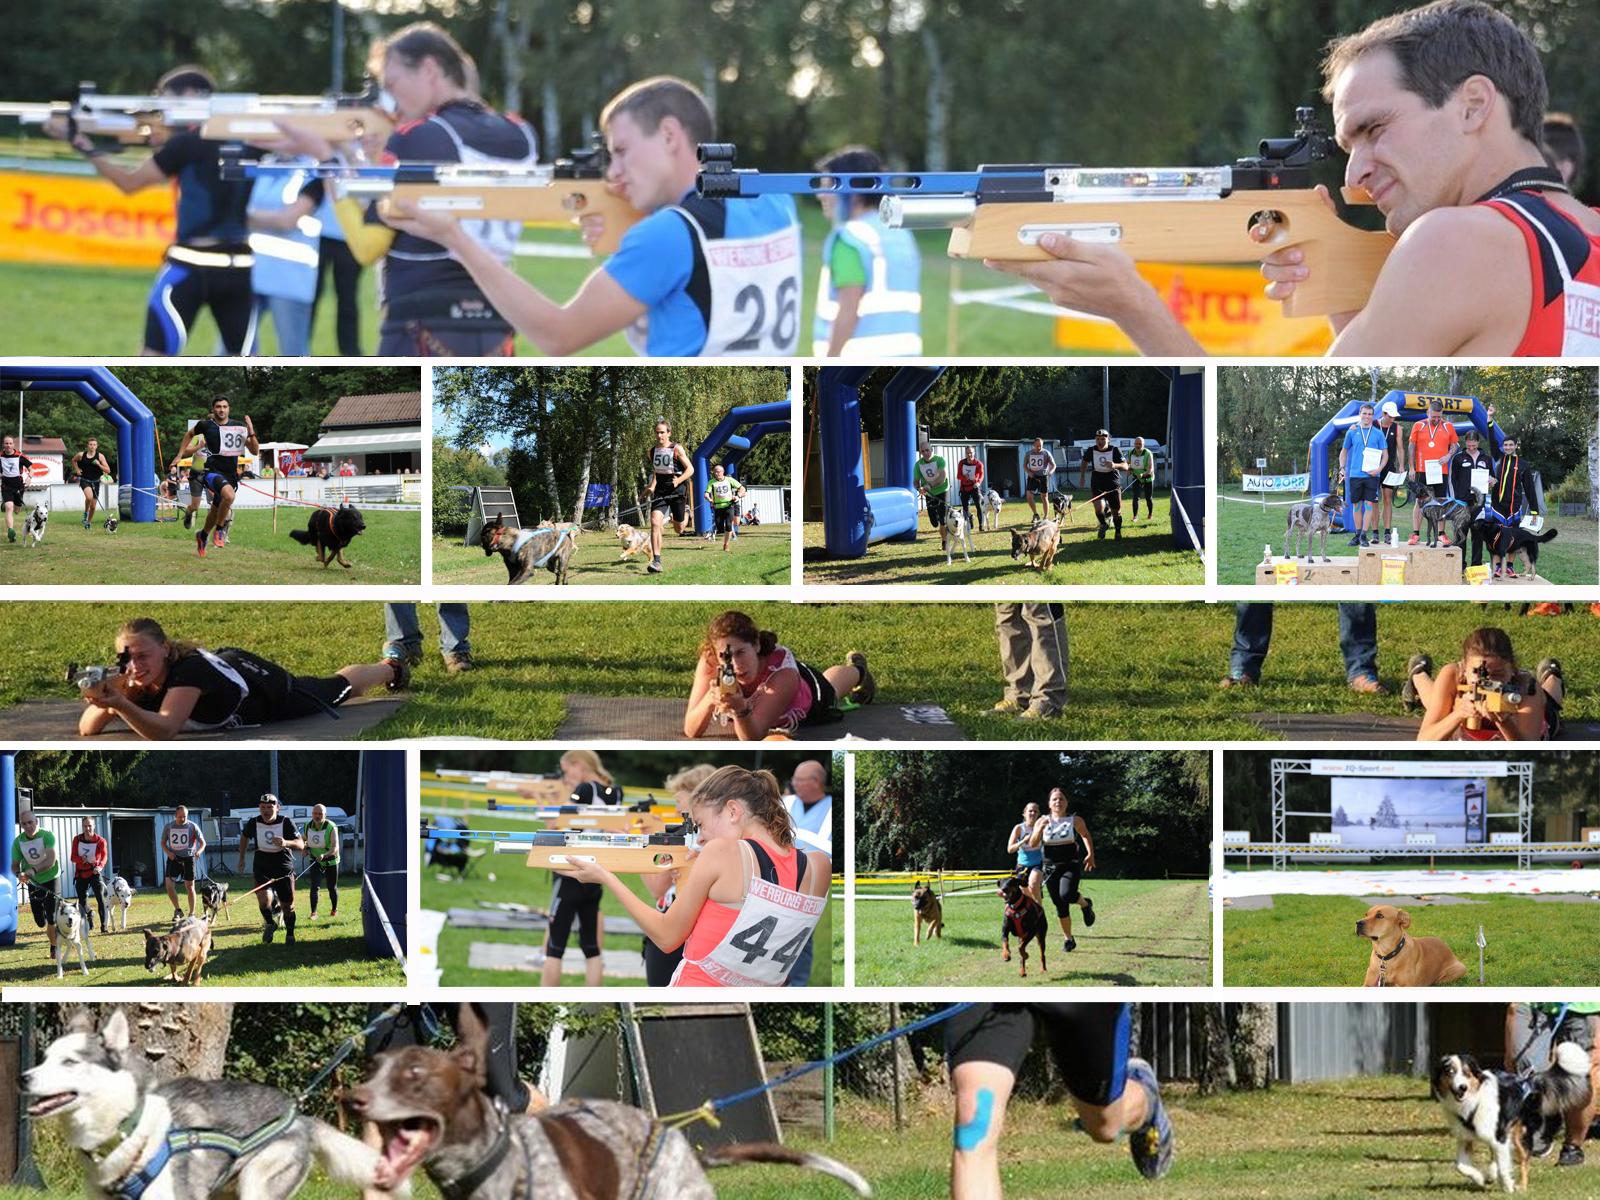 Dog‐Biathlon‐Wettkampf 2014, Homburg/Saar